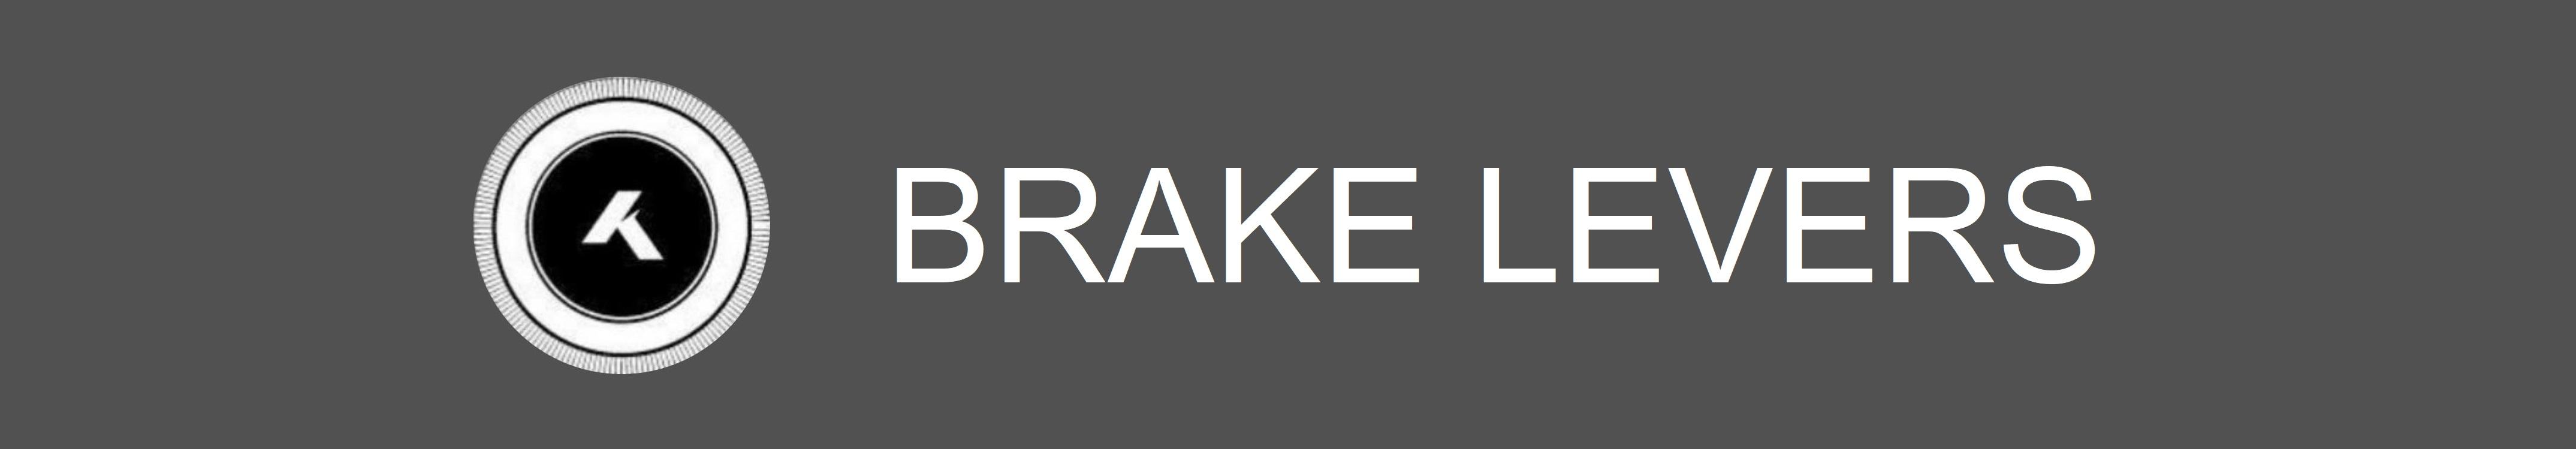 Brake-Levers